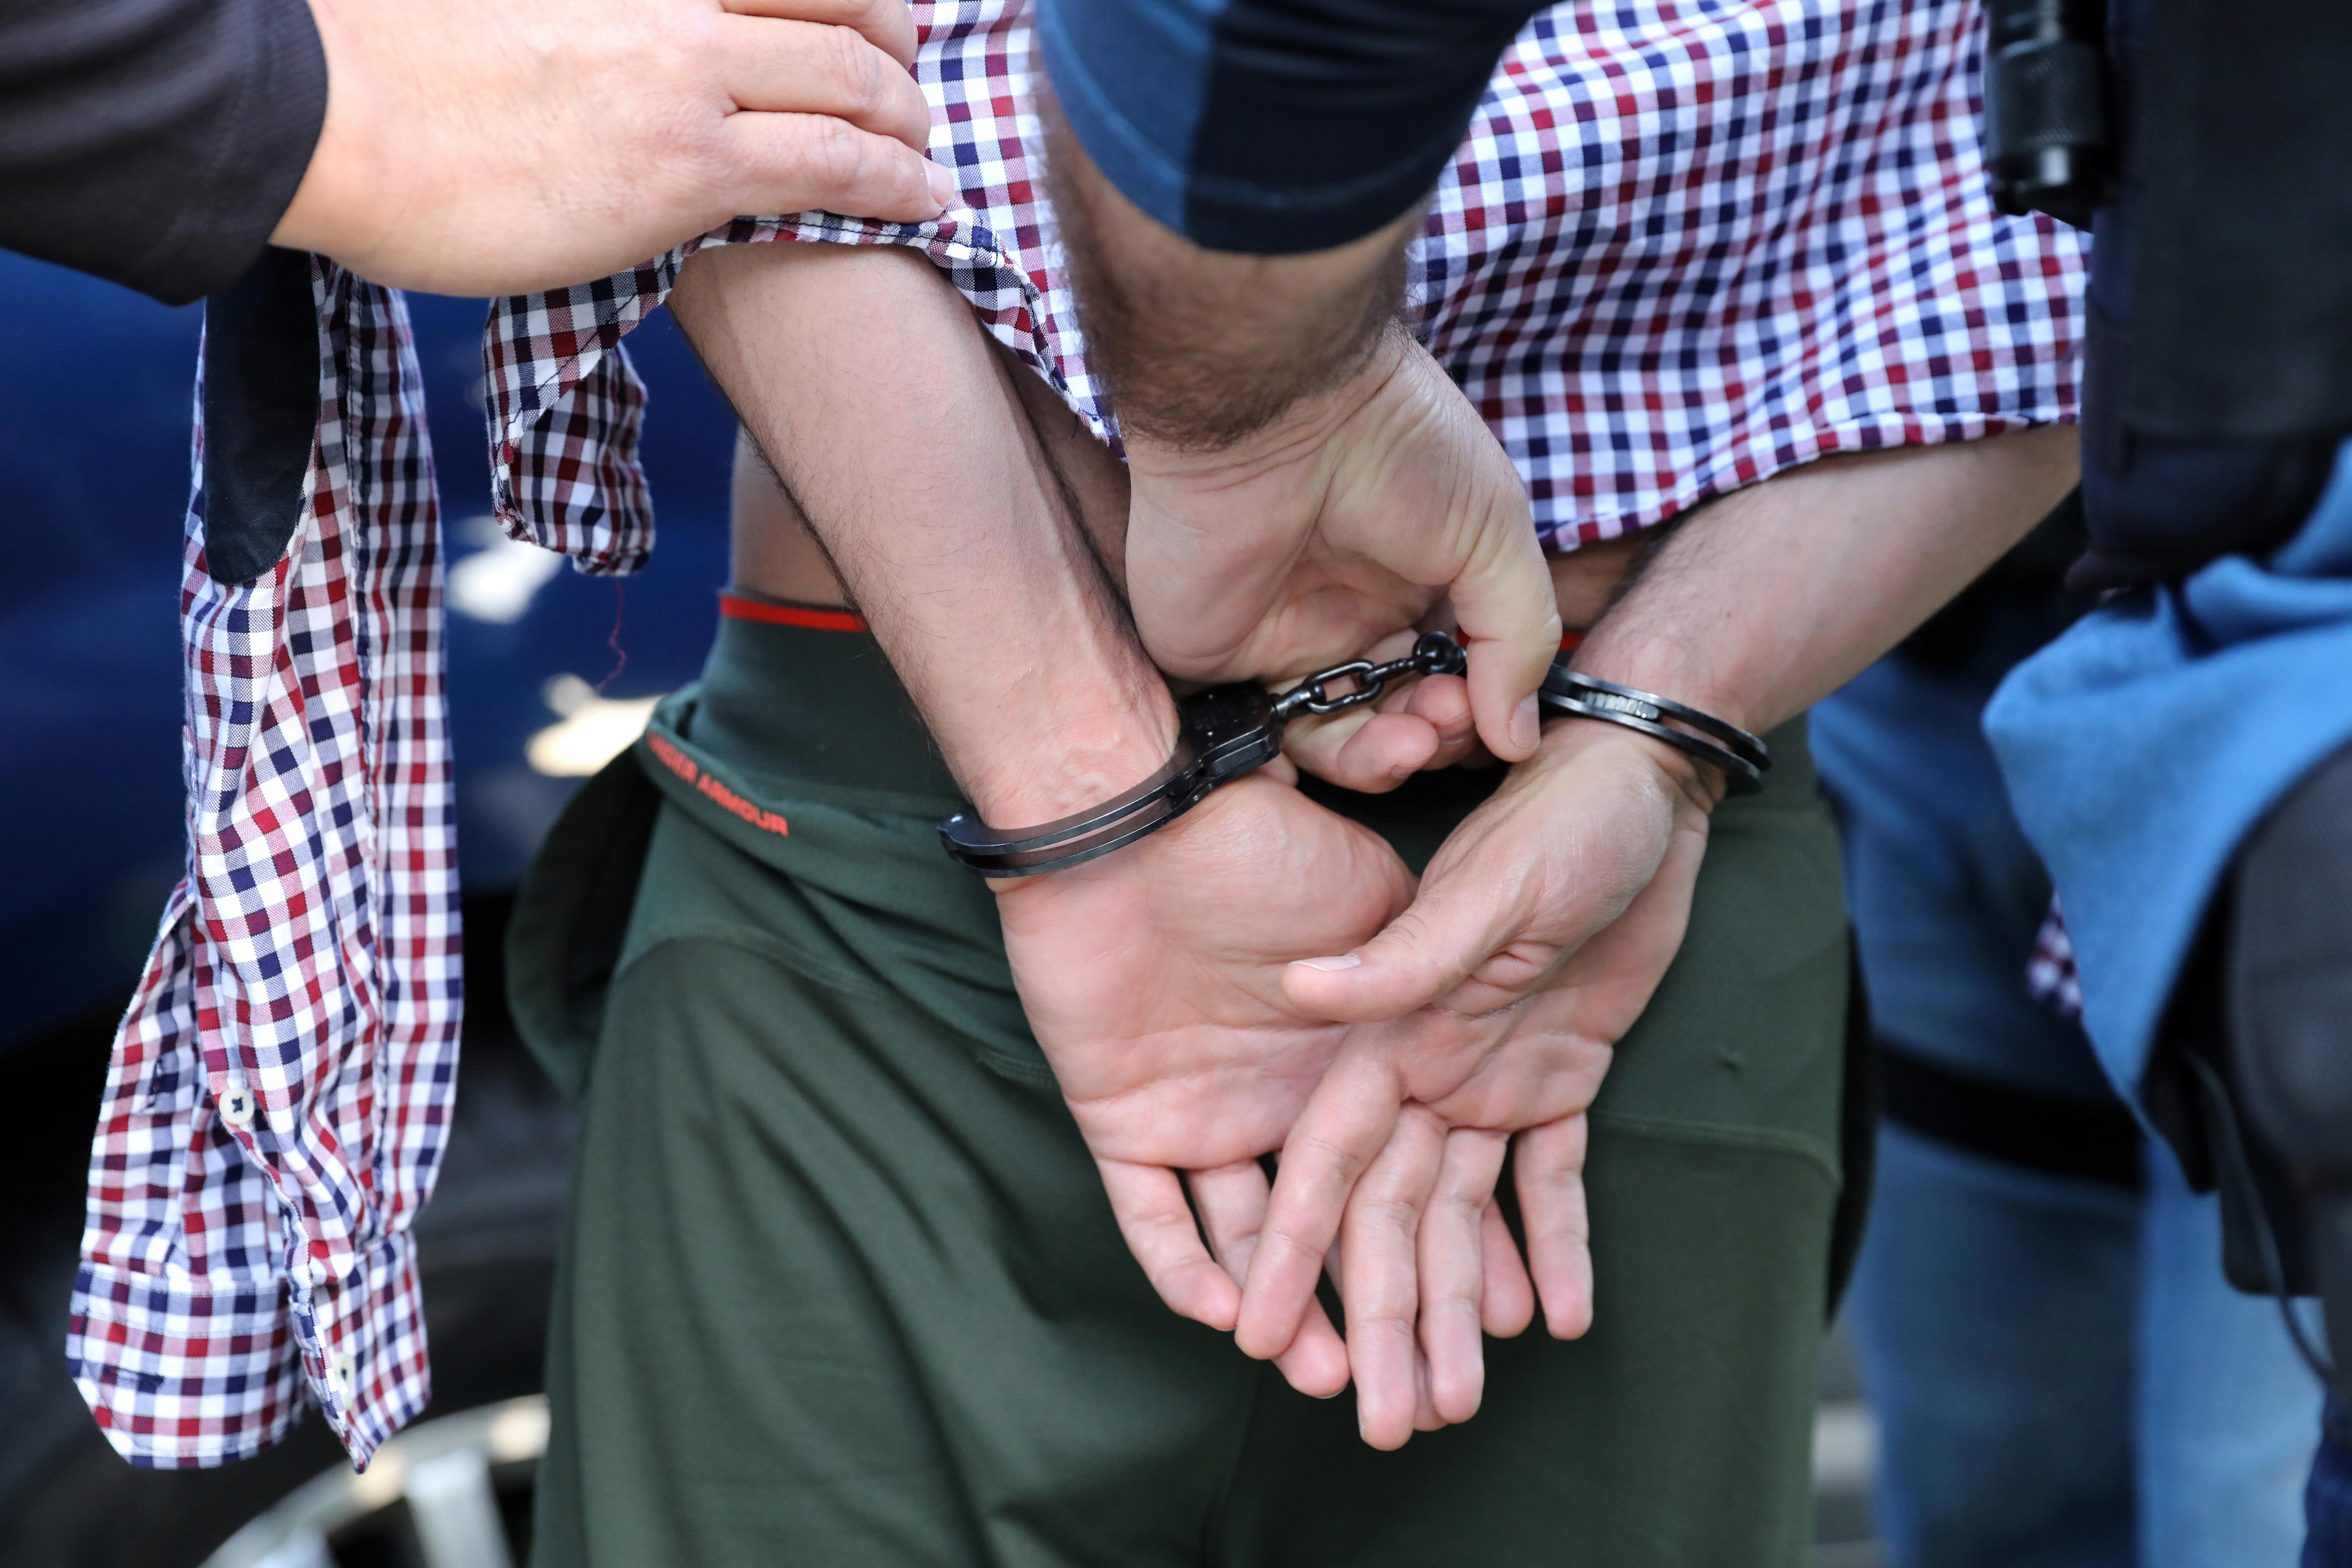 A man is handcuffed.